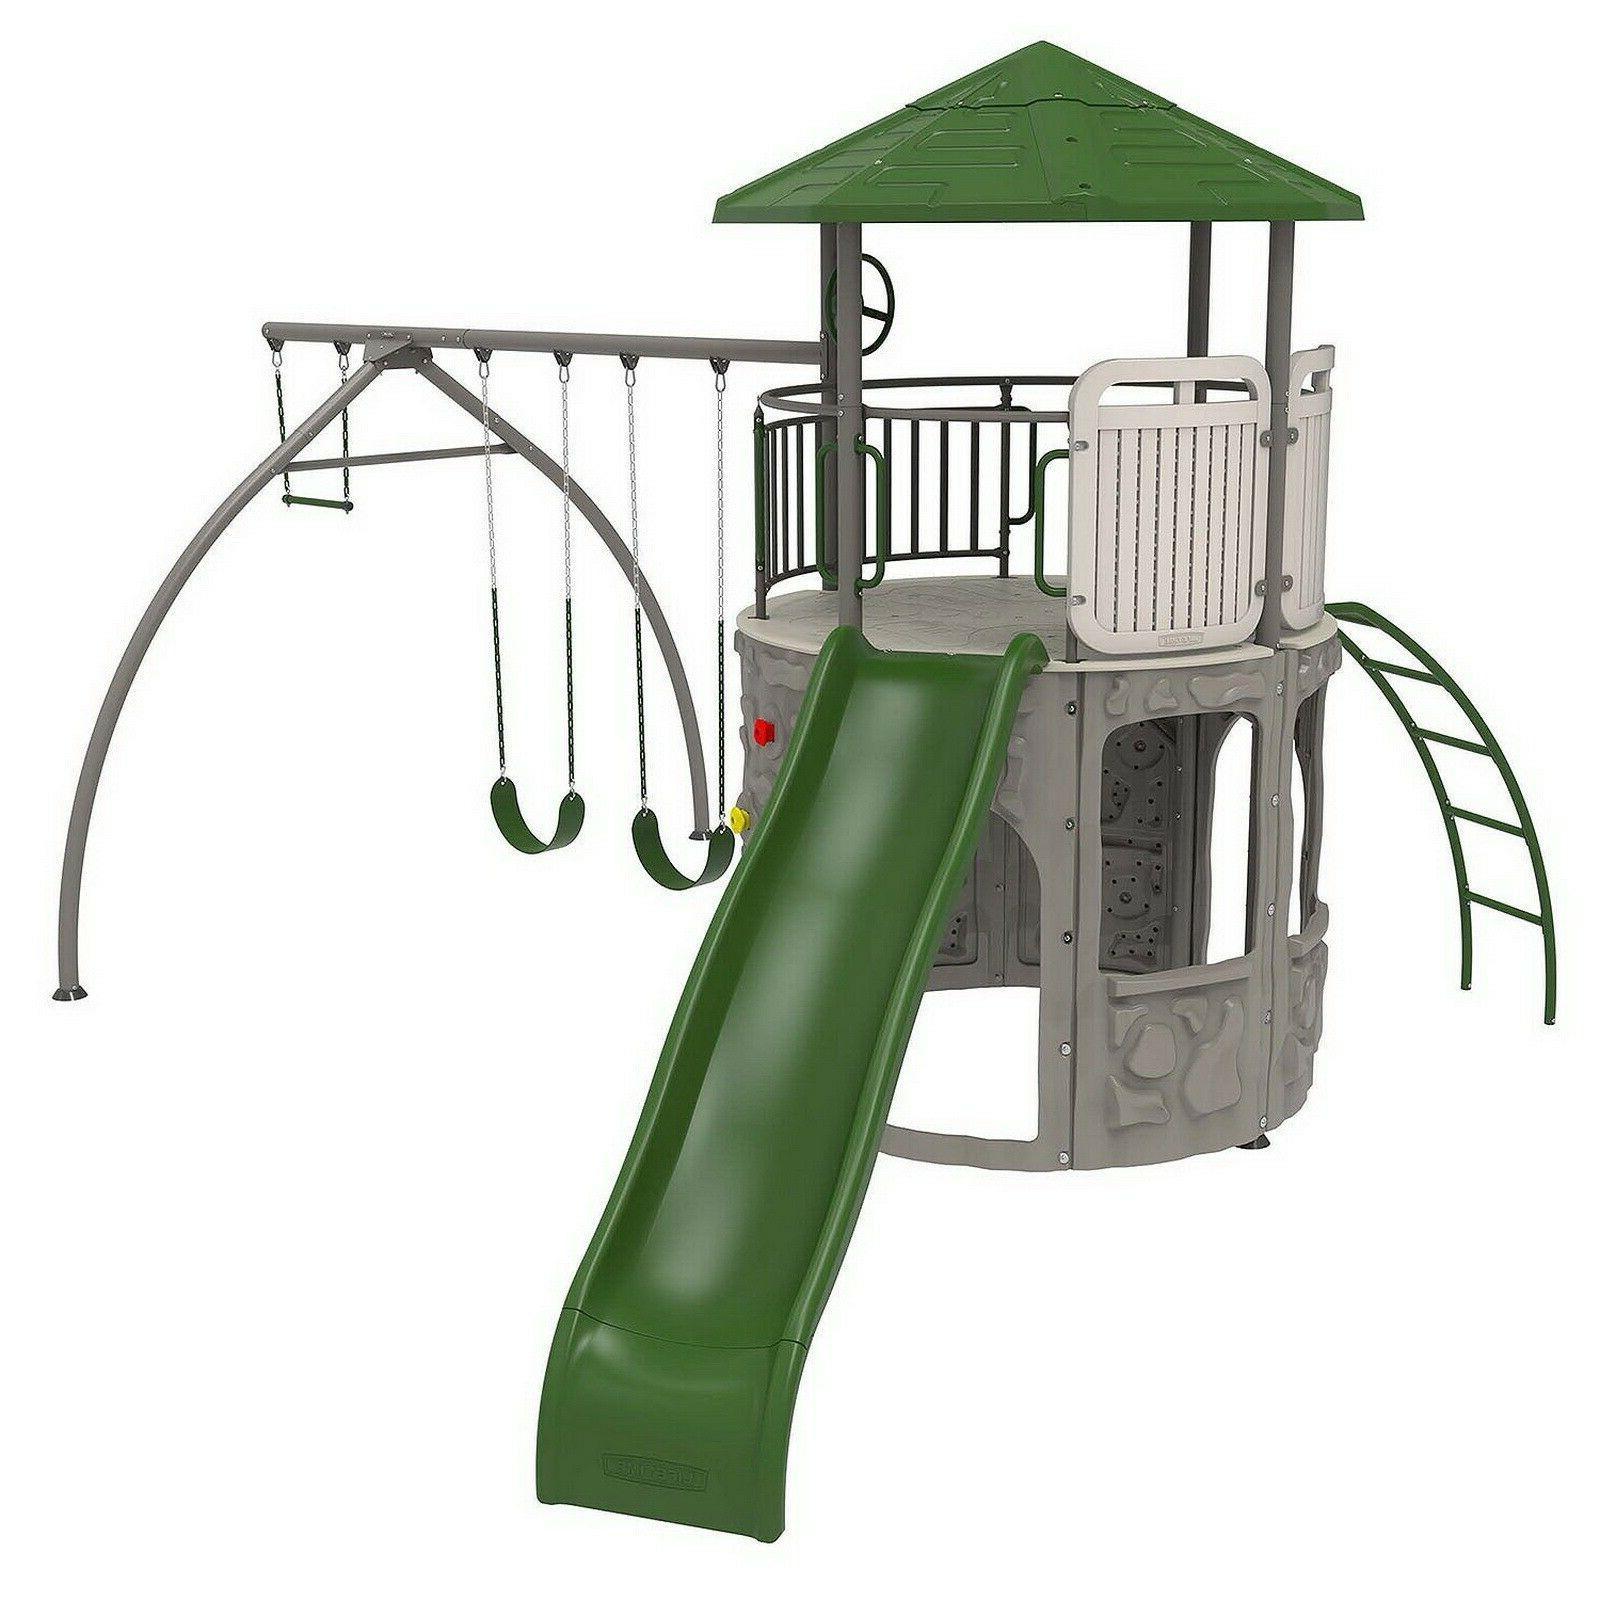 Lifetime Outdoor Playground Swingset Tower Playset Swing Sli